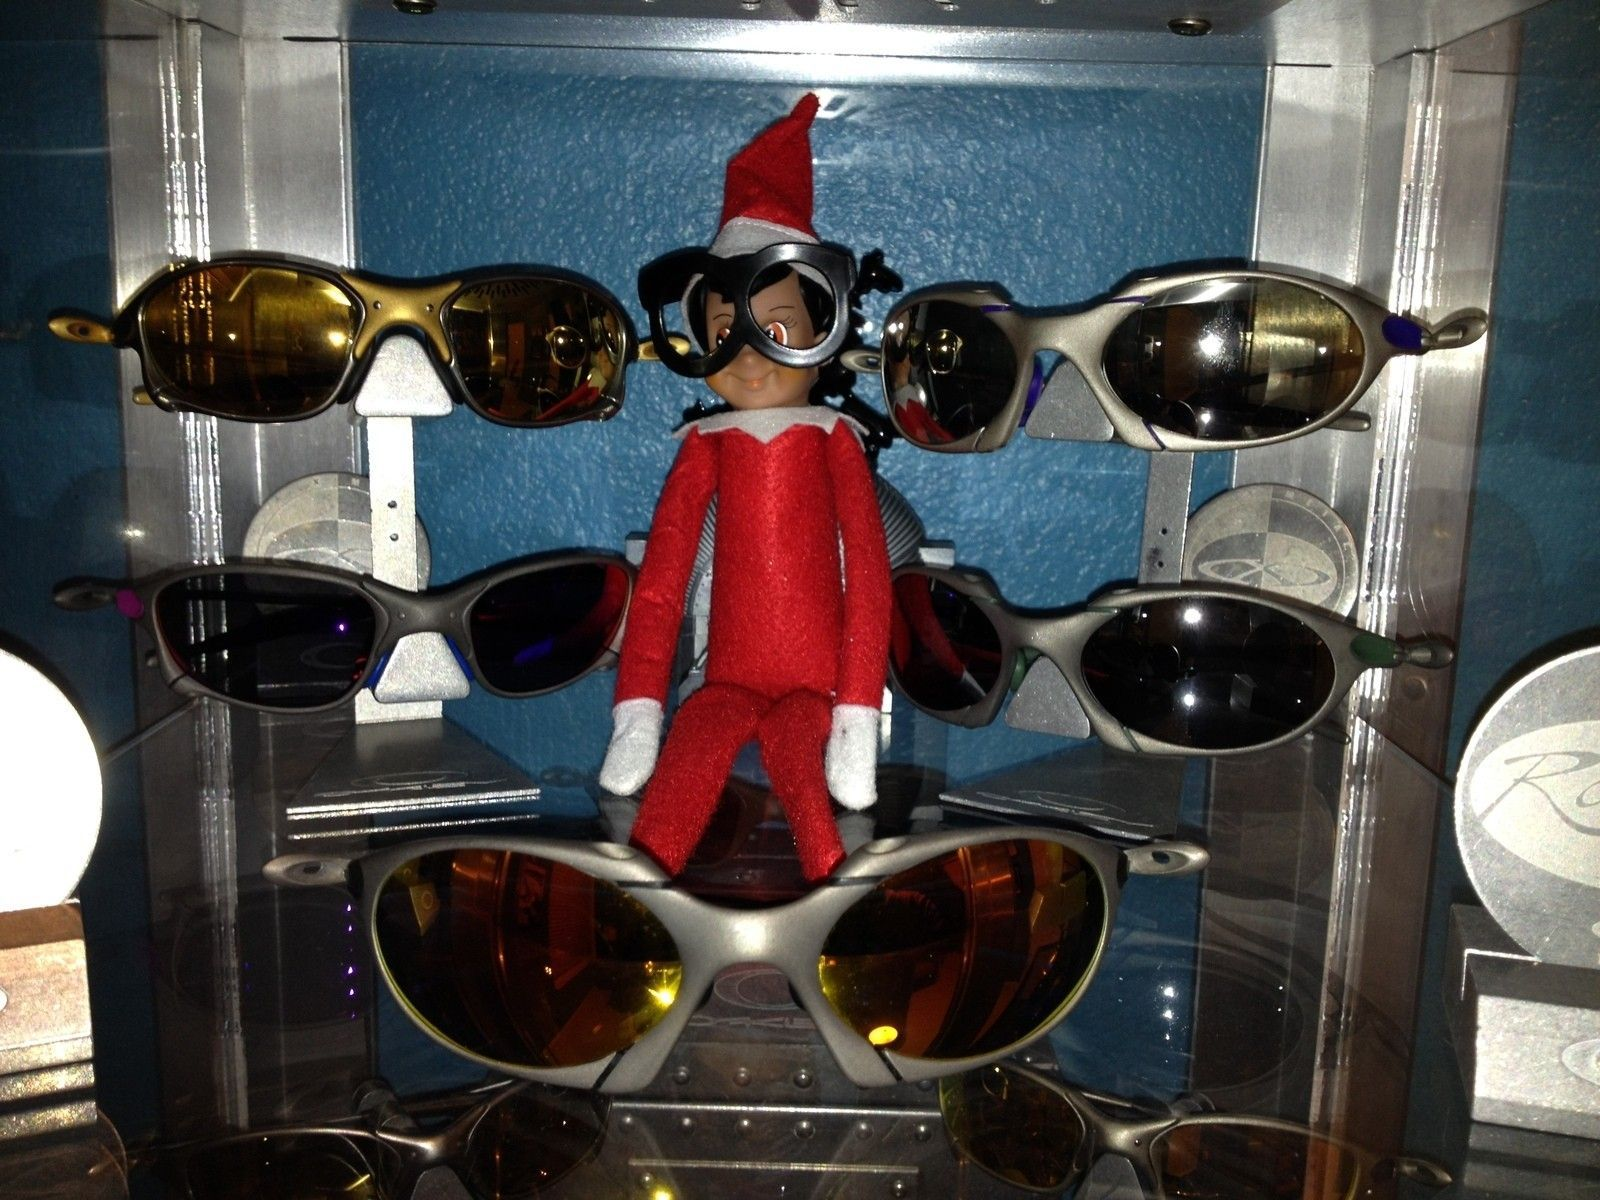 Anyone else have an elf problem? - image.jpeg